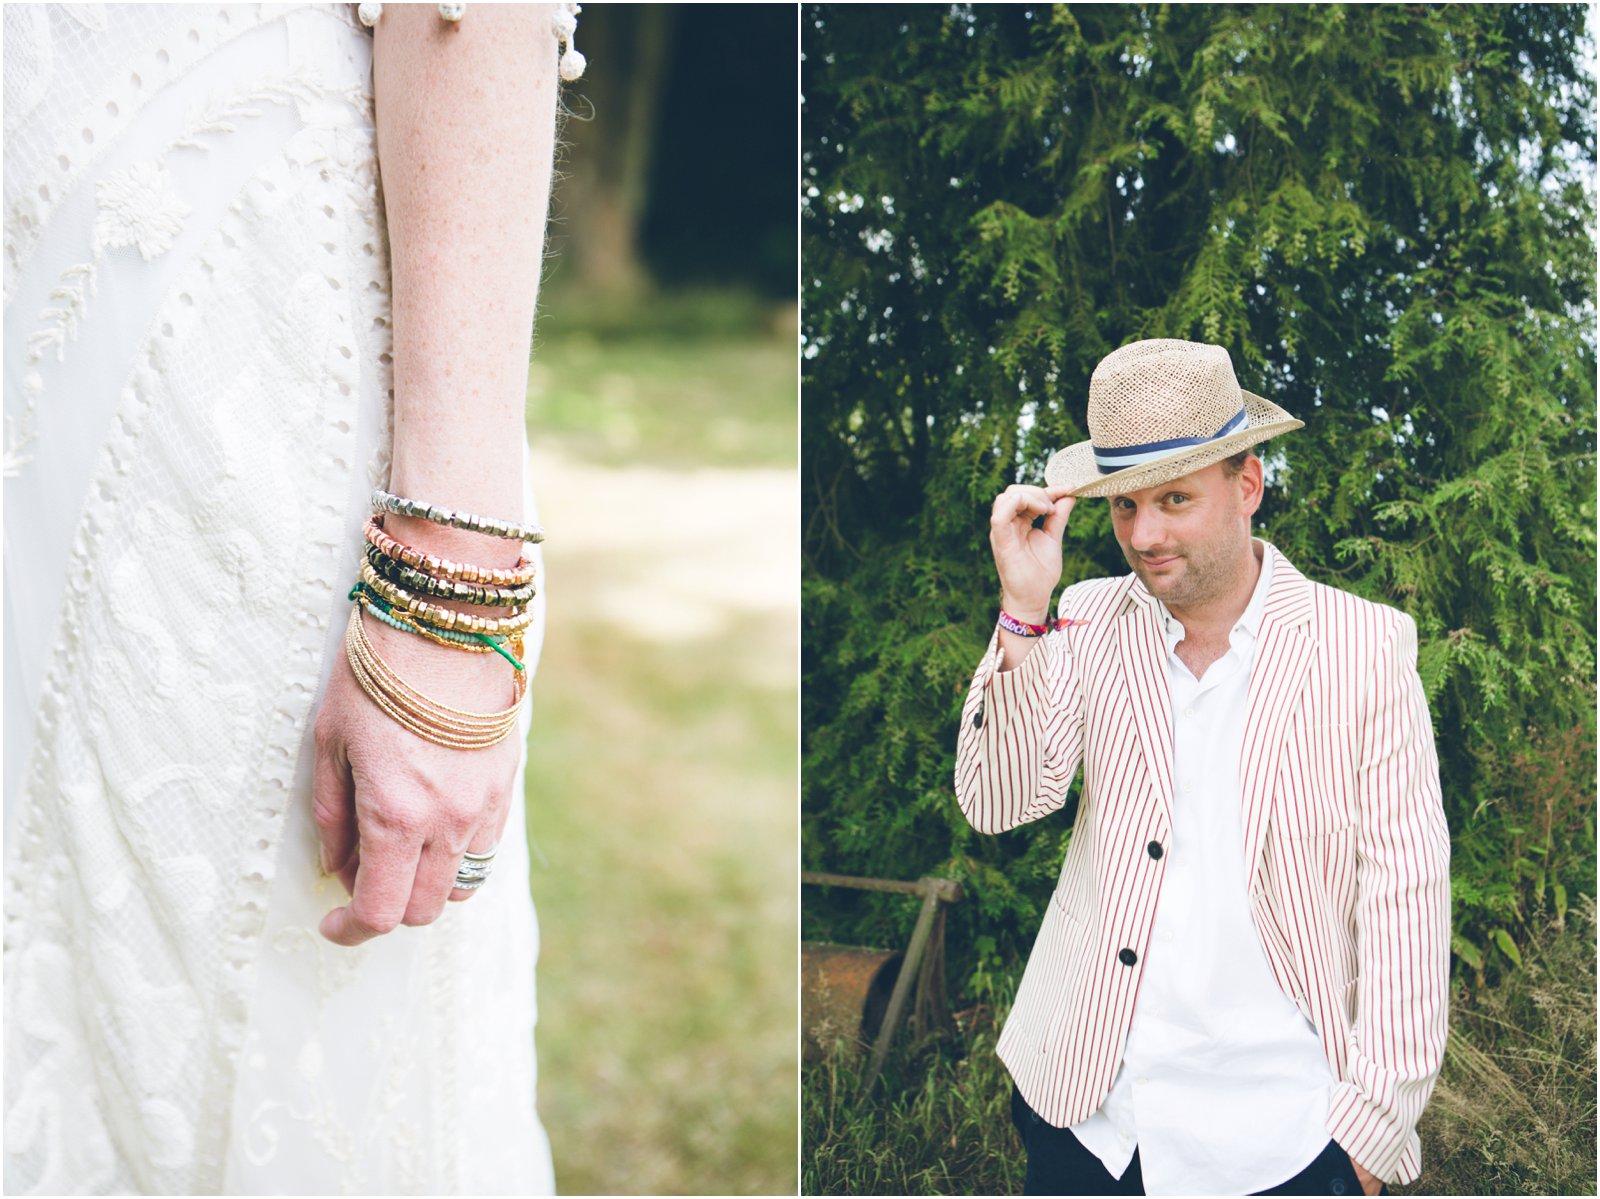 Sally and Damien's wedding festival by Summertown Pictures-34_DerrynSchmidt